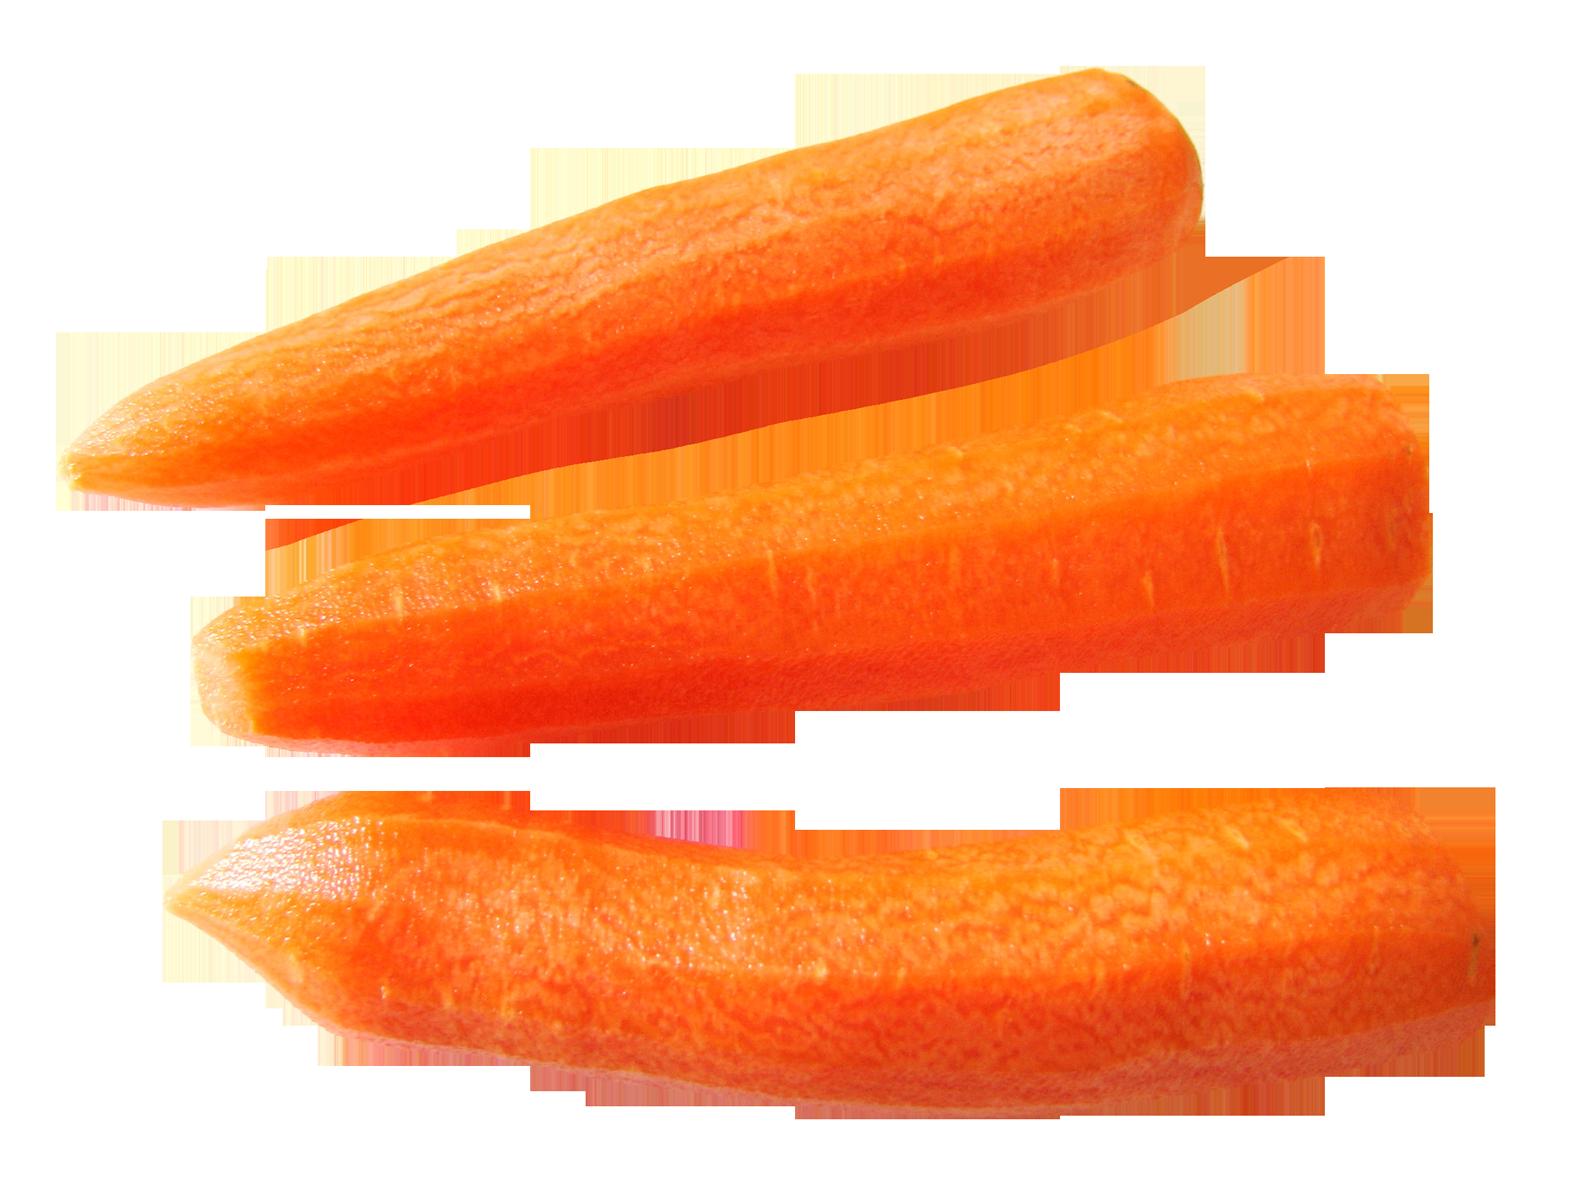 Carrot HD PNG - 117311